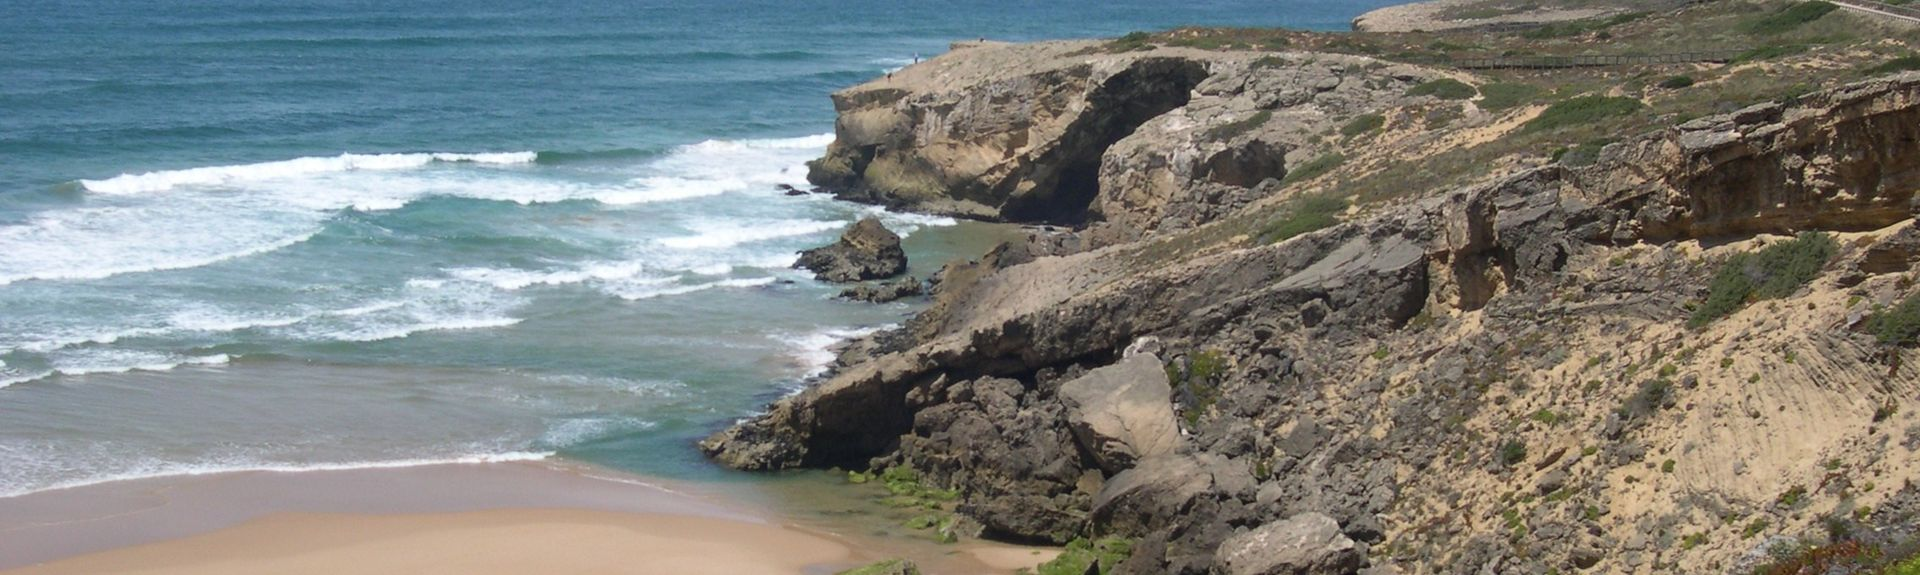 Playa de Monte Clérigo, Aljezur, Distrito de Faro, Portugal